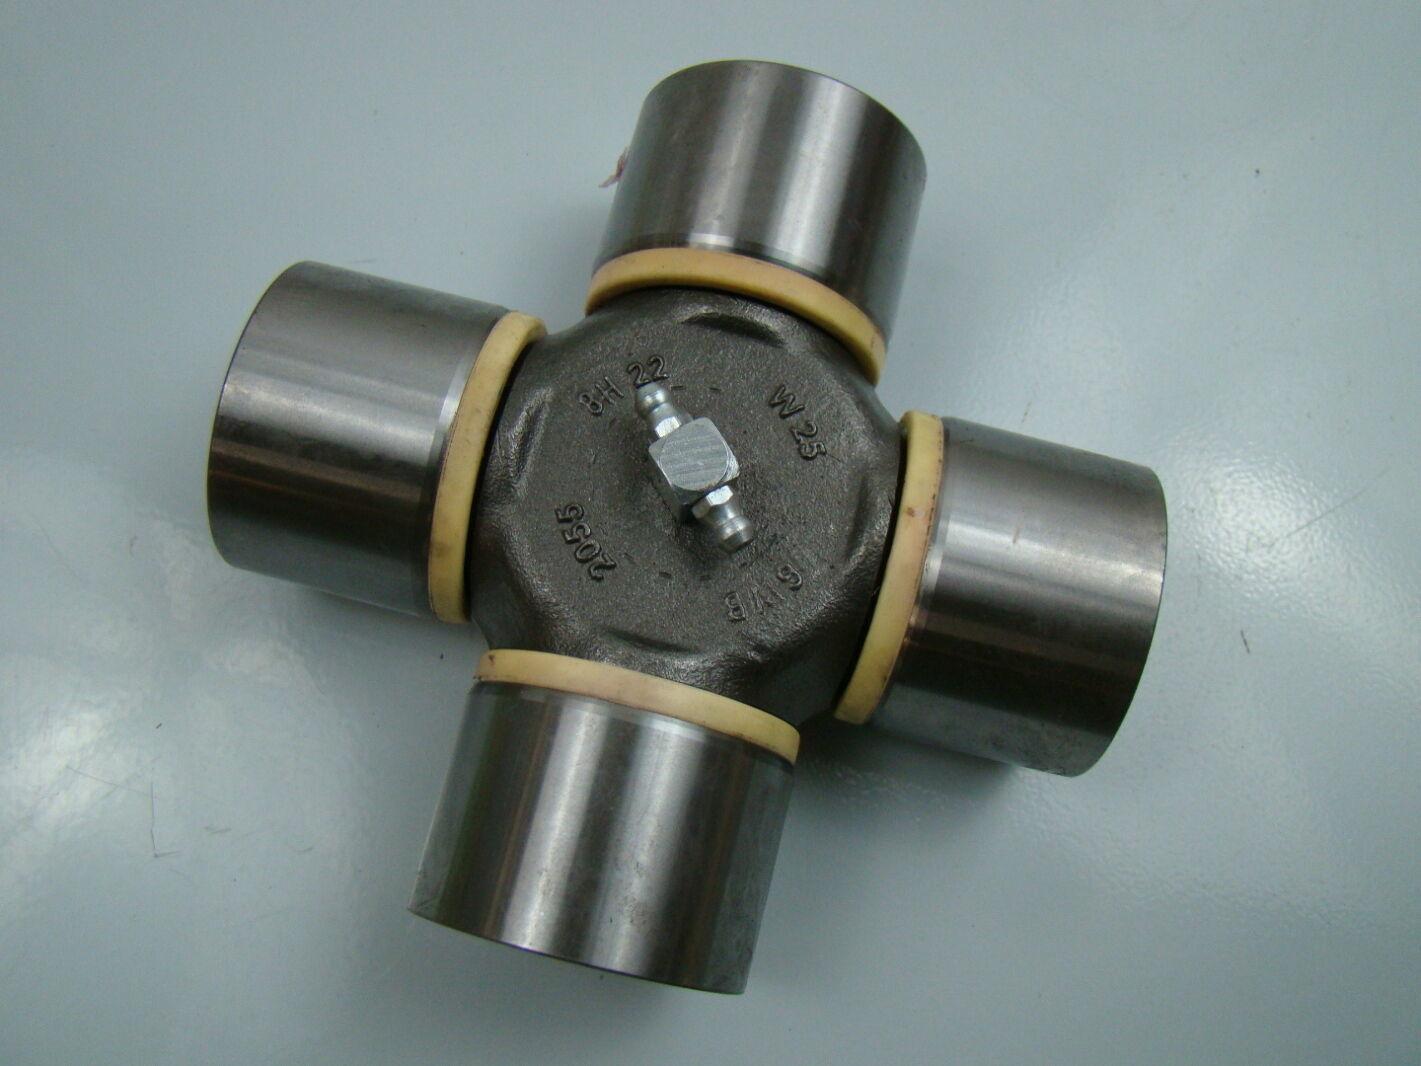 Kit Gmbh gwb spicer gelenkwellenbau gmbh co kg universal joint repair kit